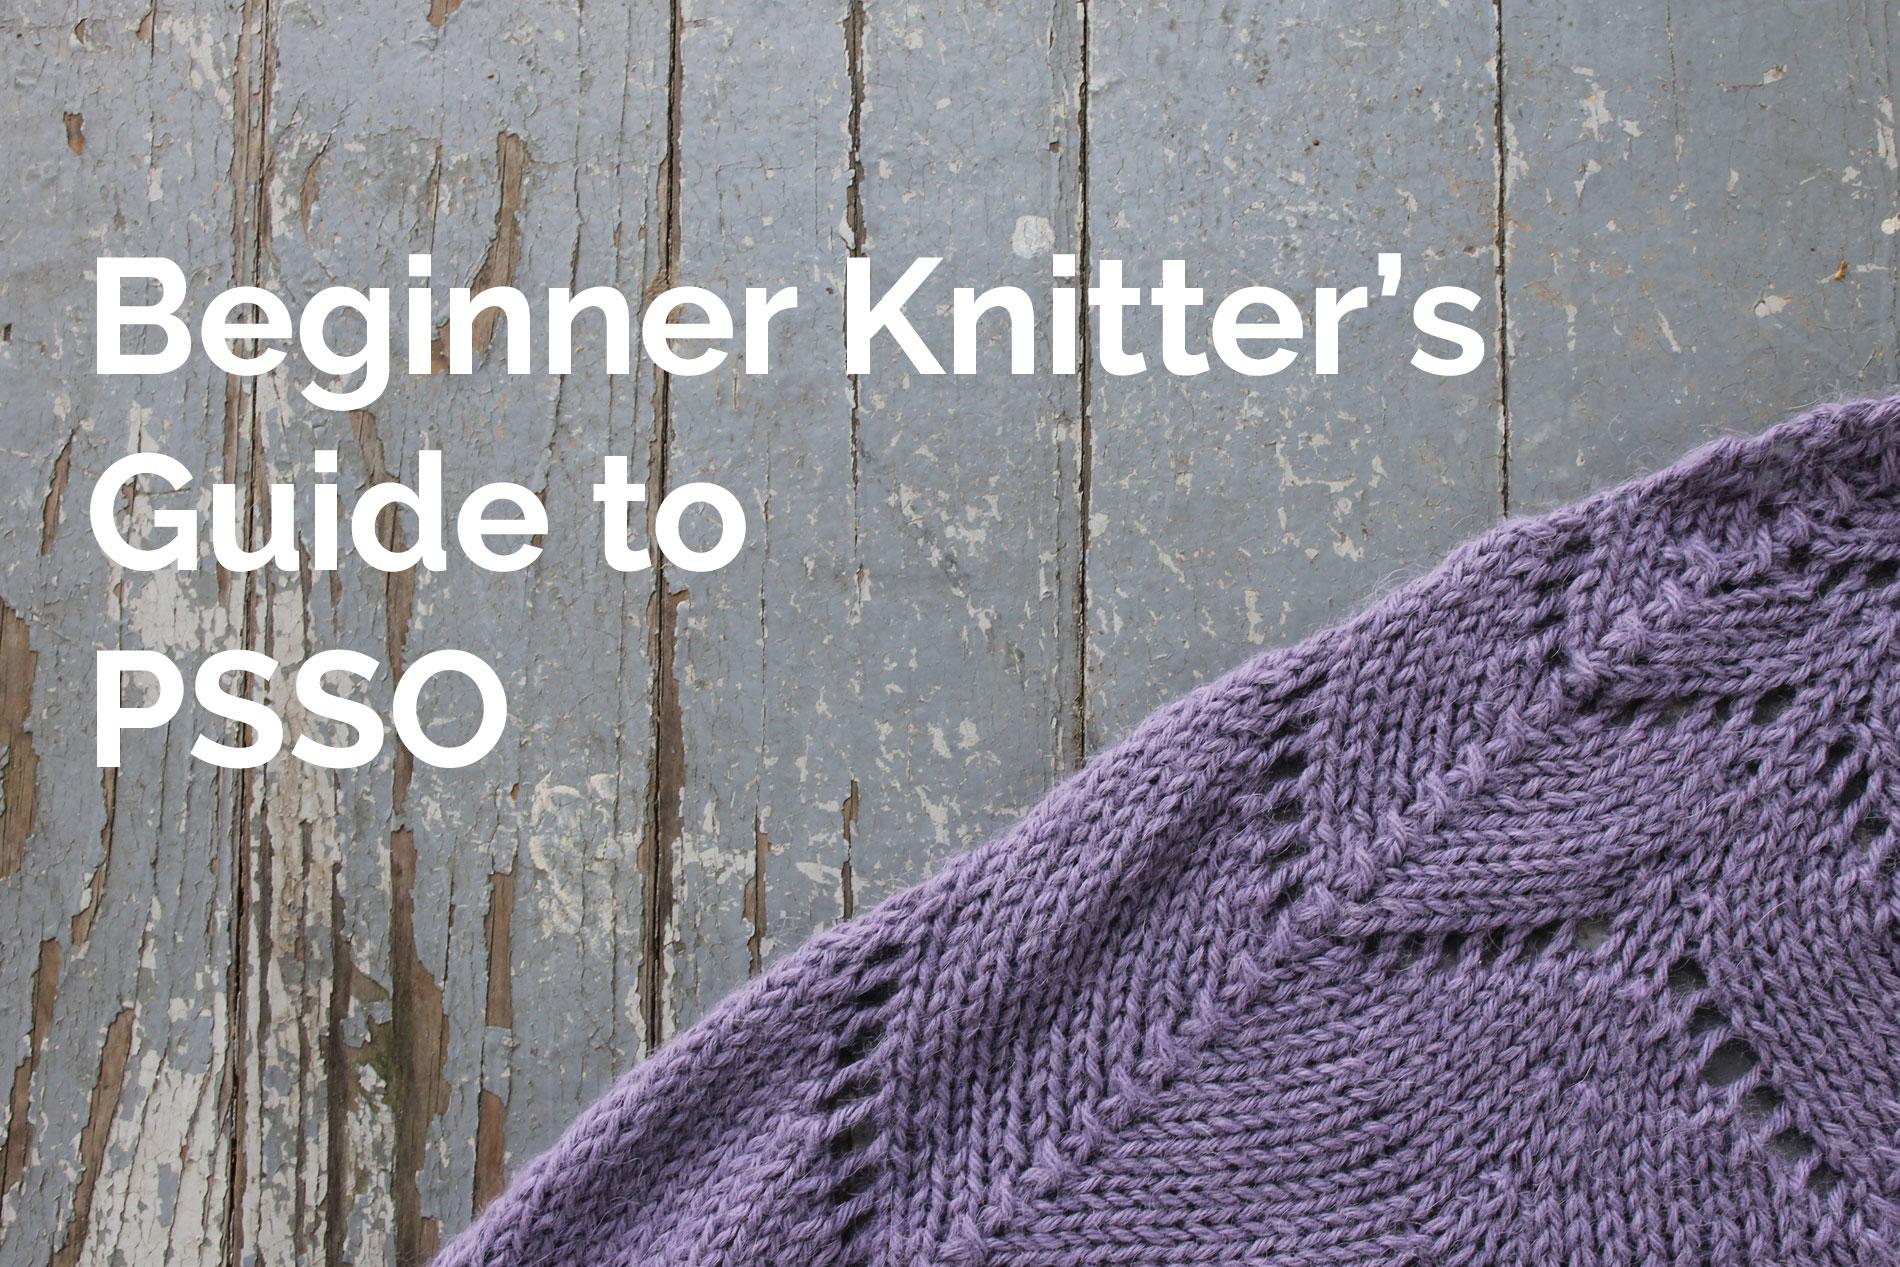 Beginner Knitter's Guide to PSSO